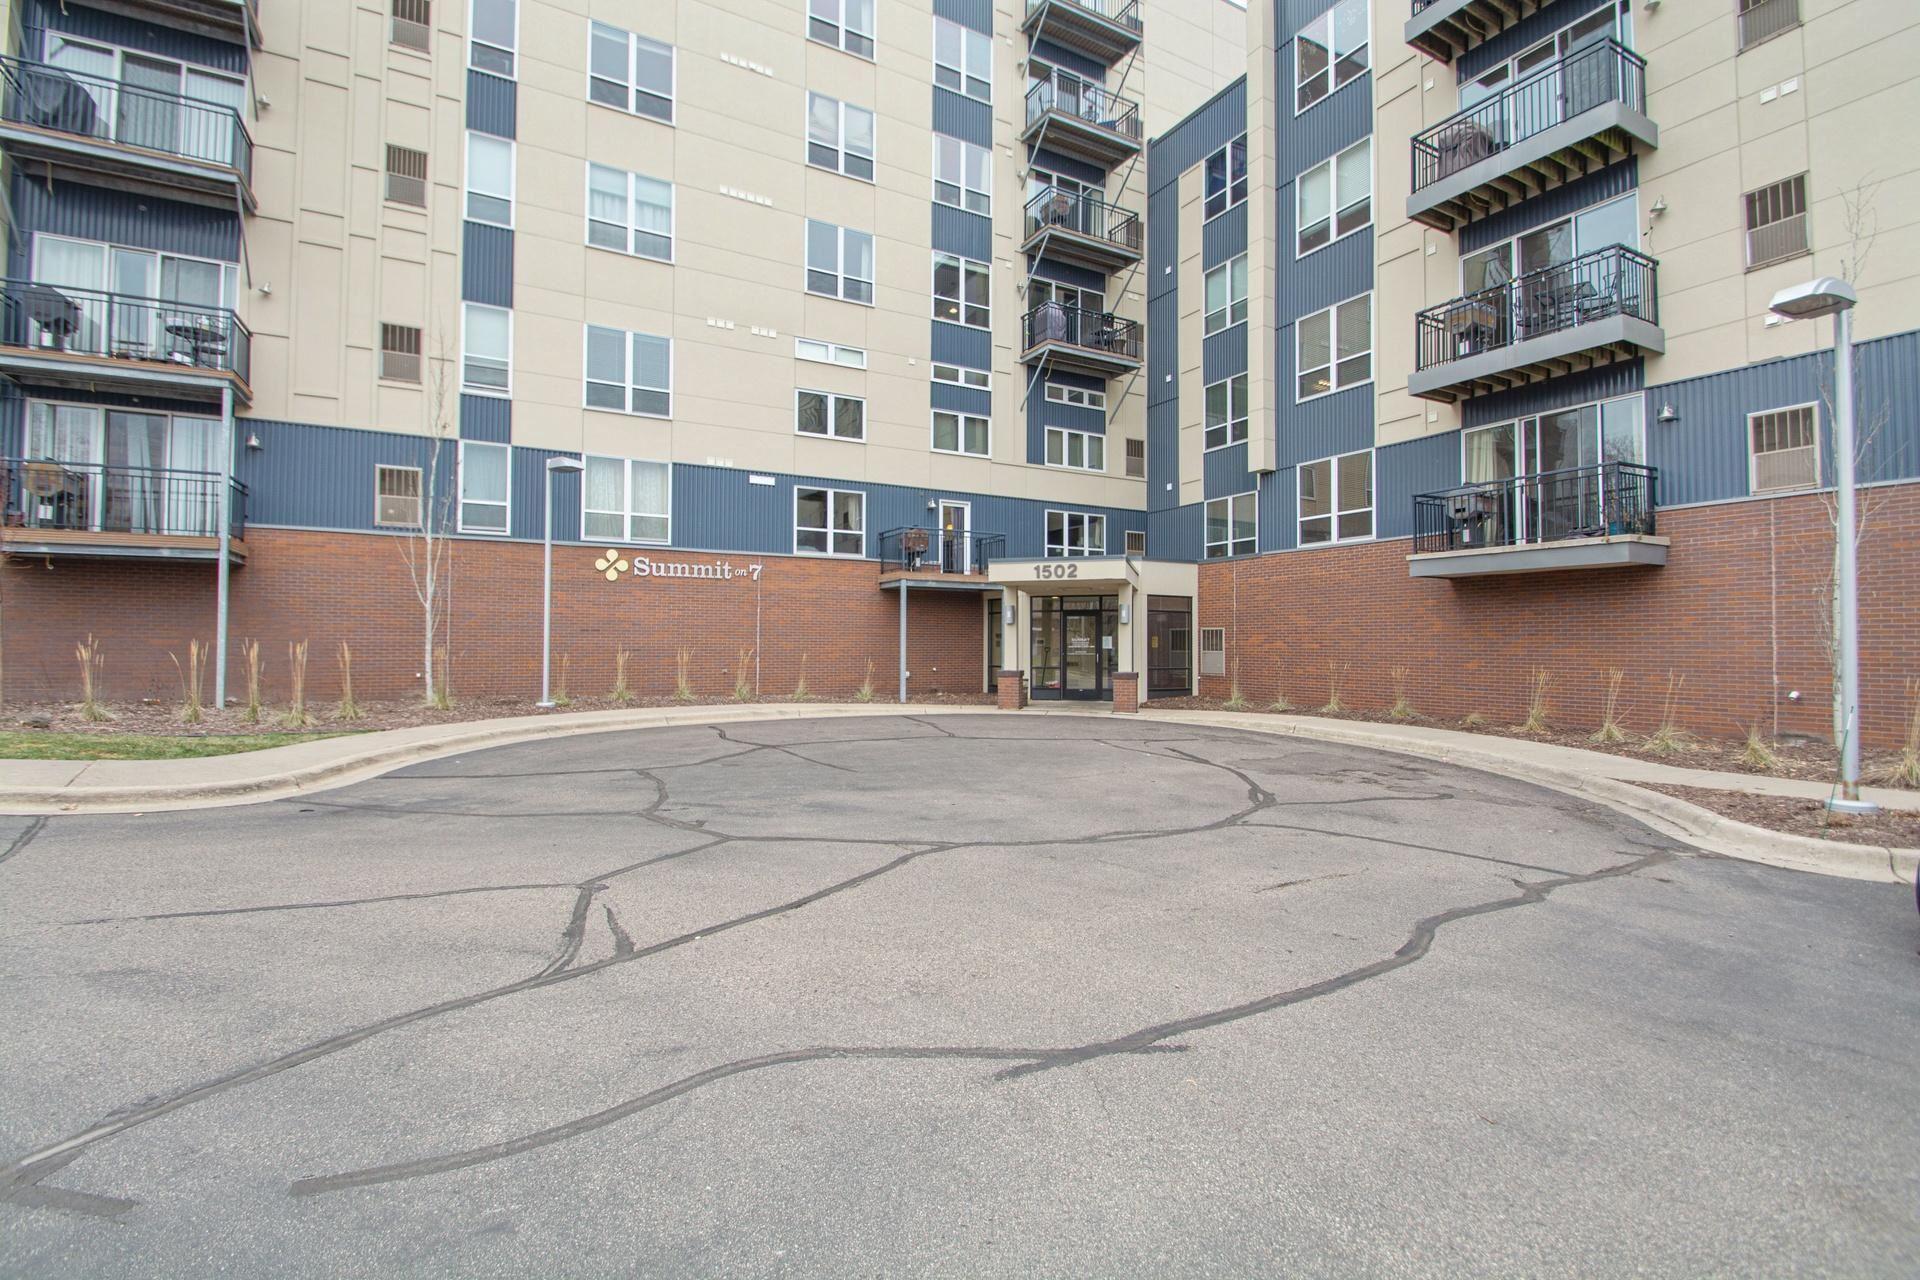 1502 5th Street N #602, Hopkins, MN 55305 - MLS#: 5685527